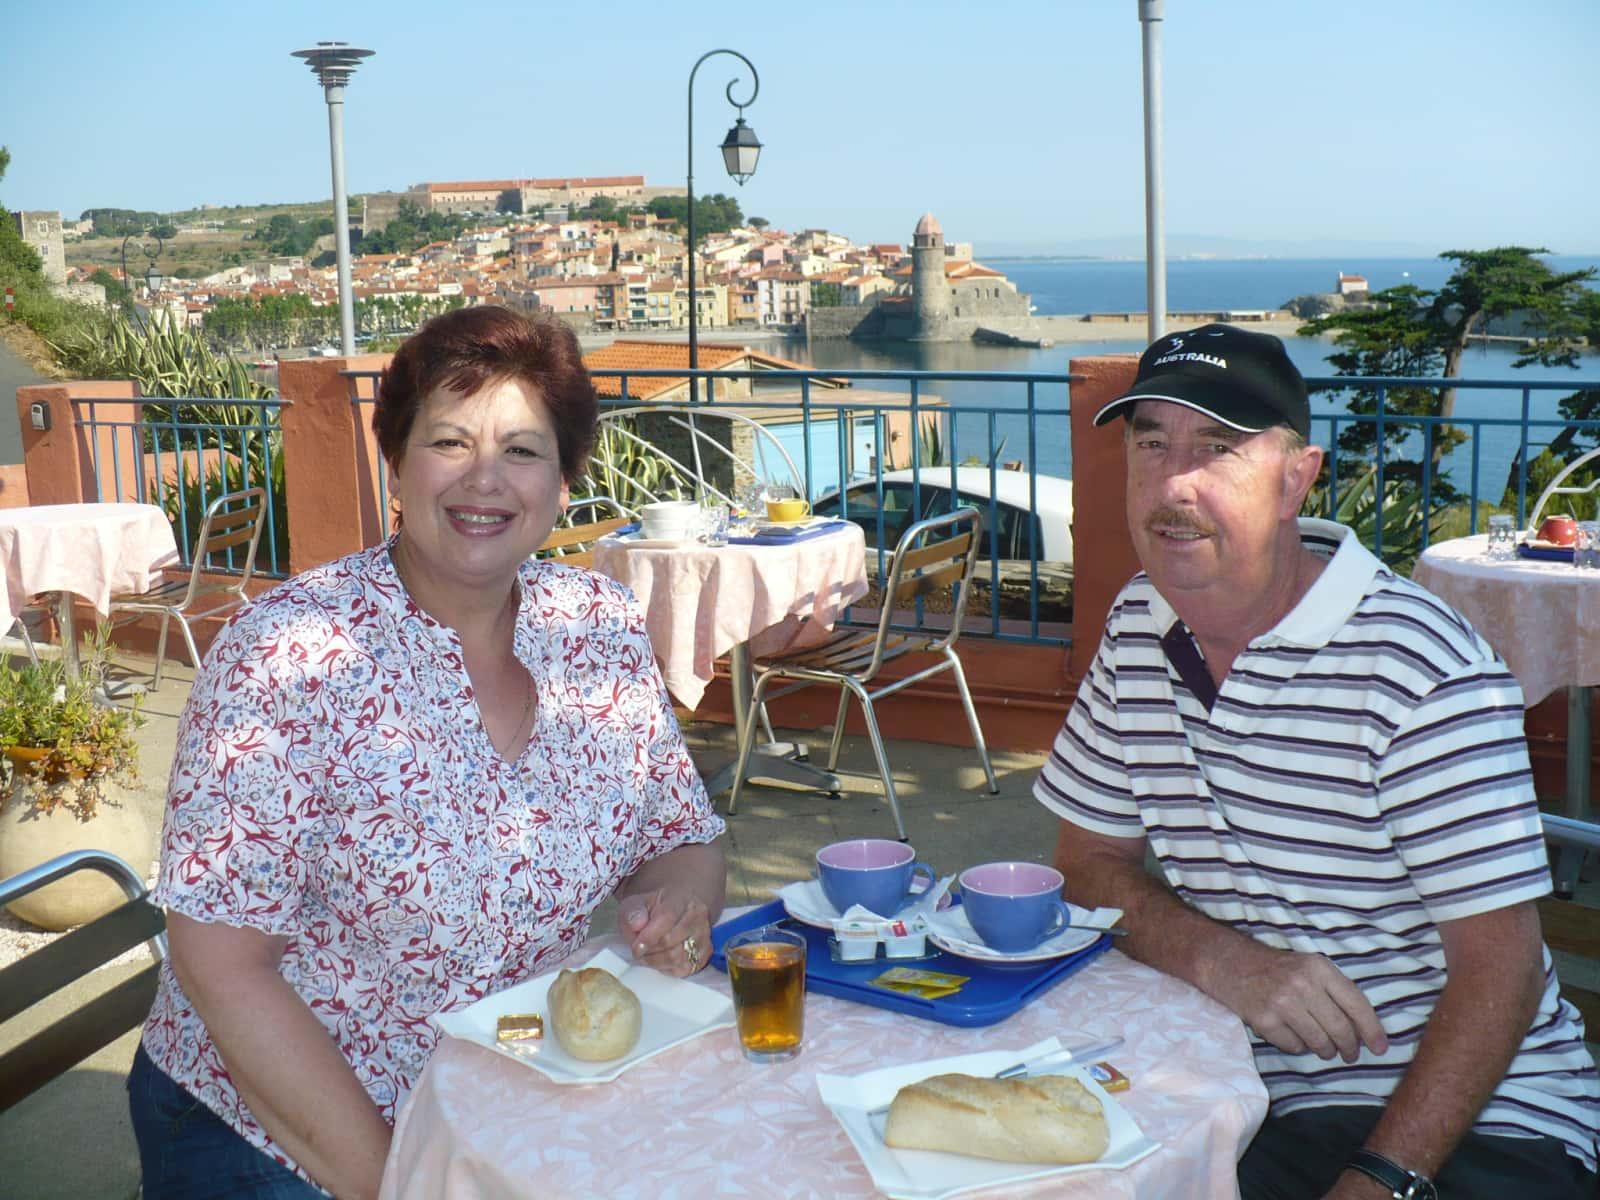 Wayne & Sue from Canberra, Australian Capital Territory, Australia